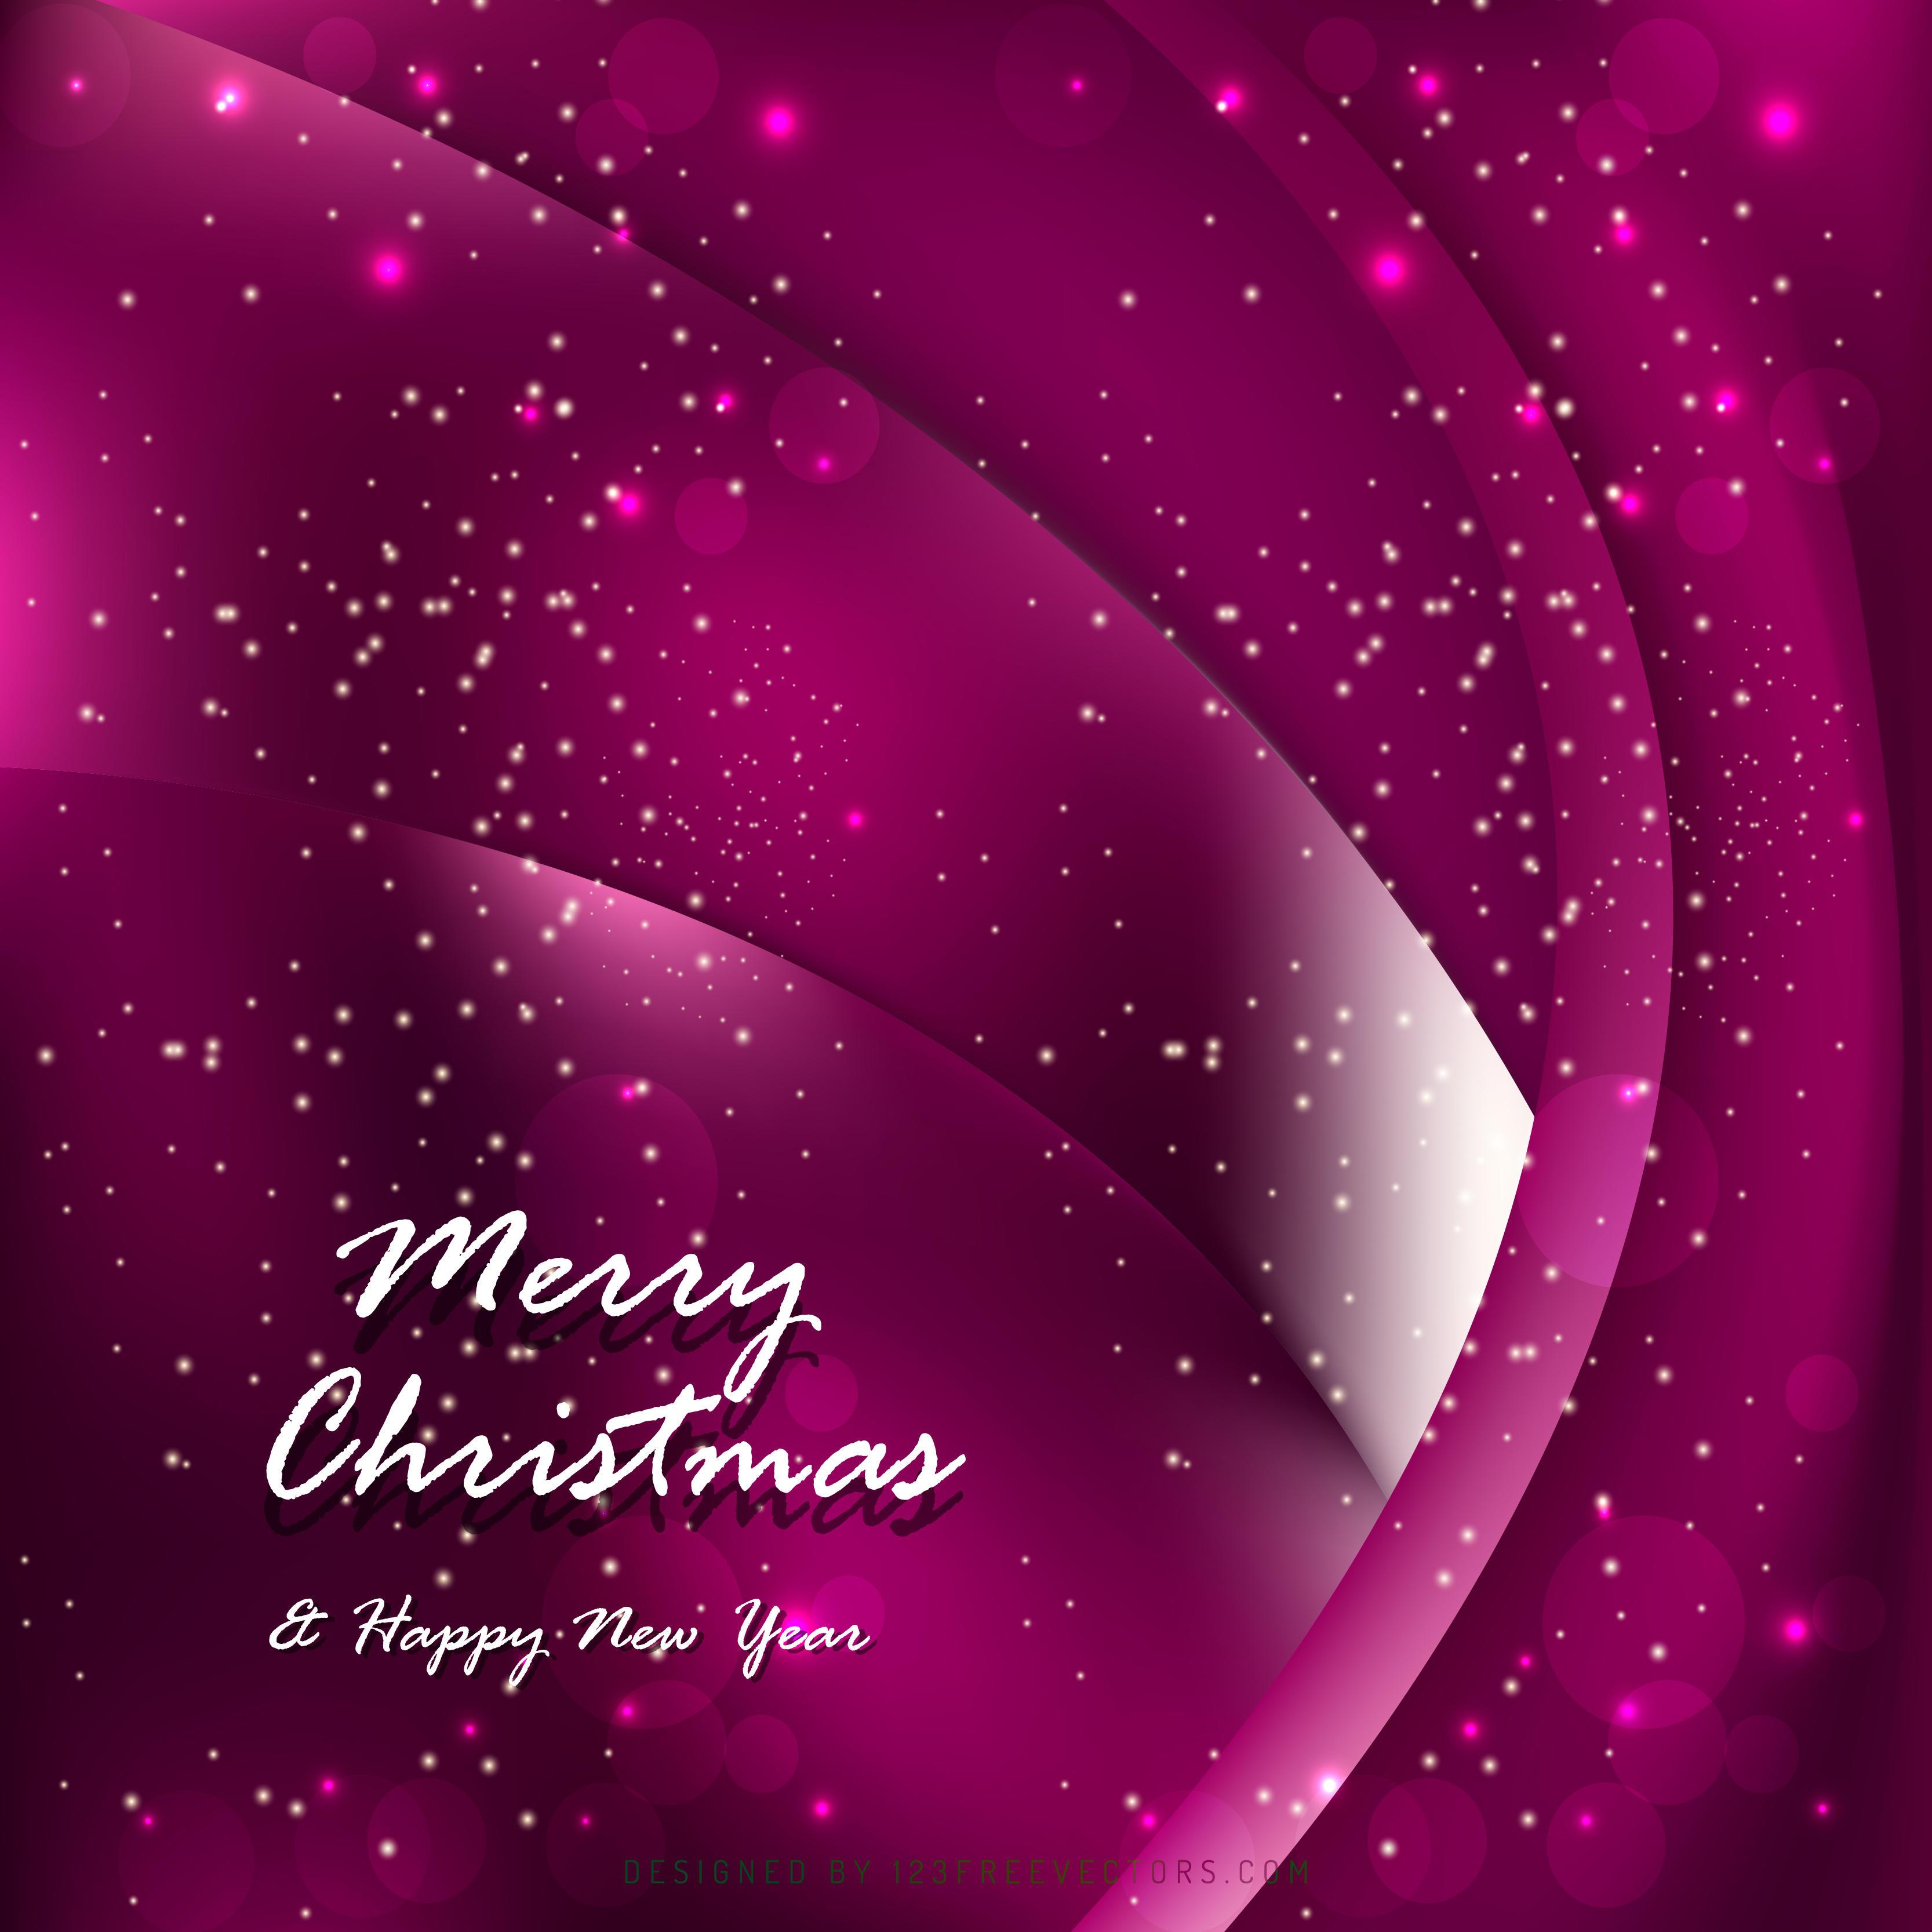 Tyrian Purple Christmas Background Image